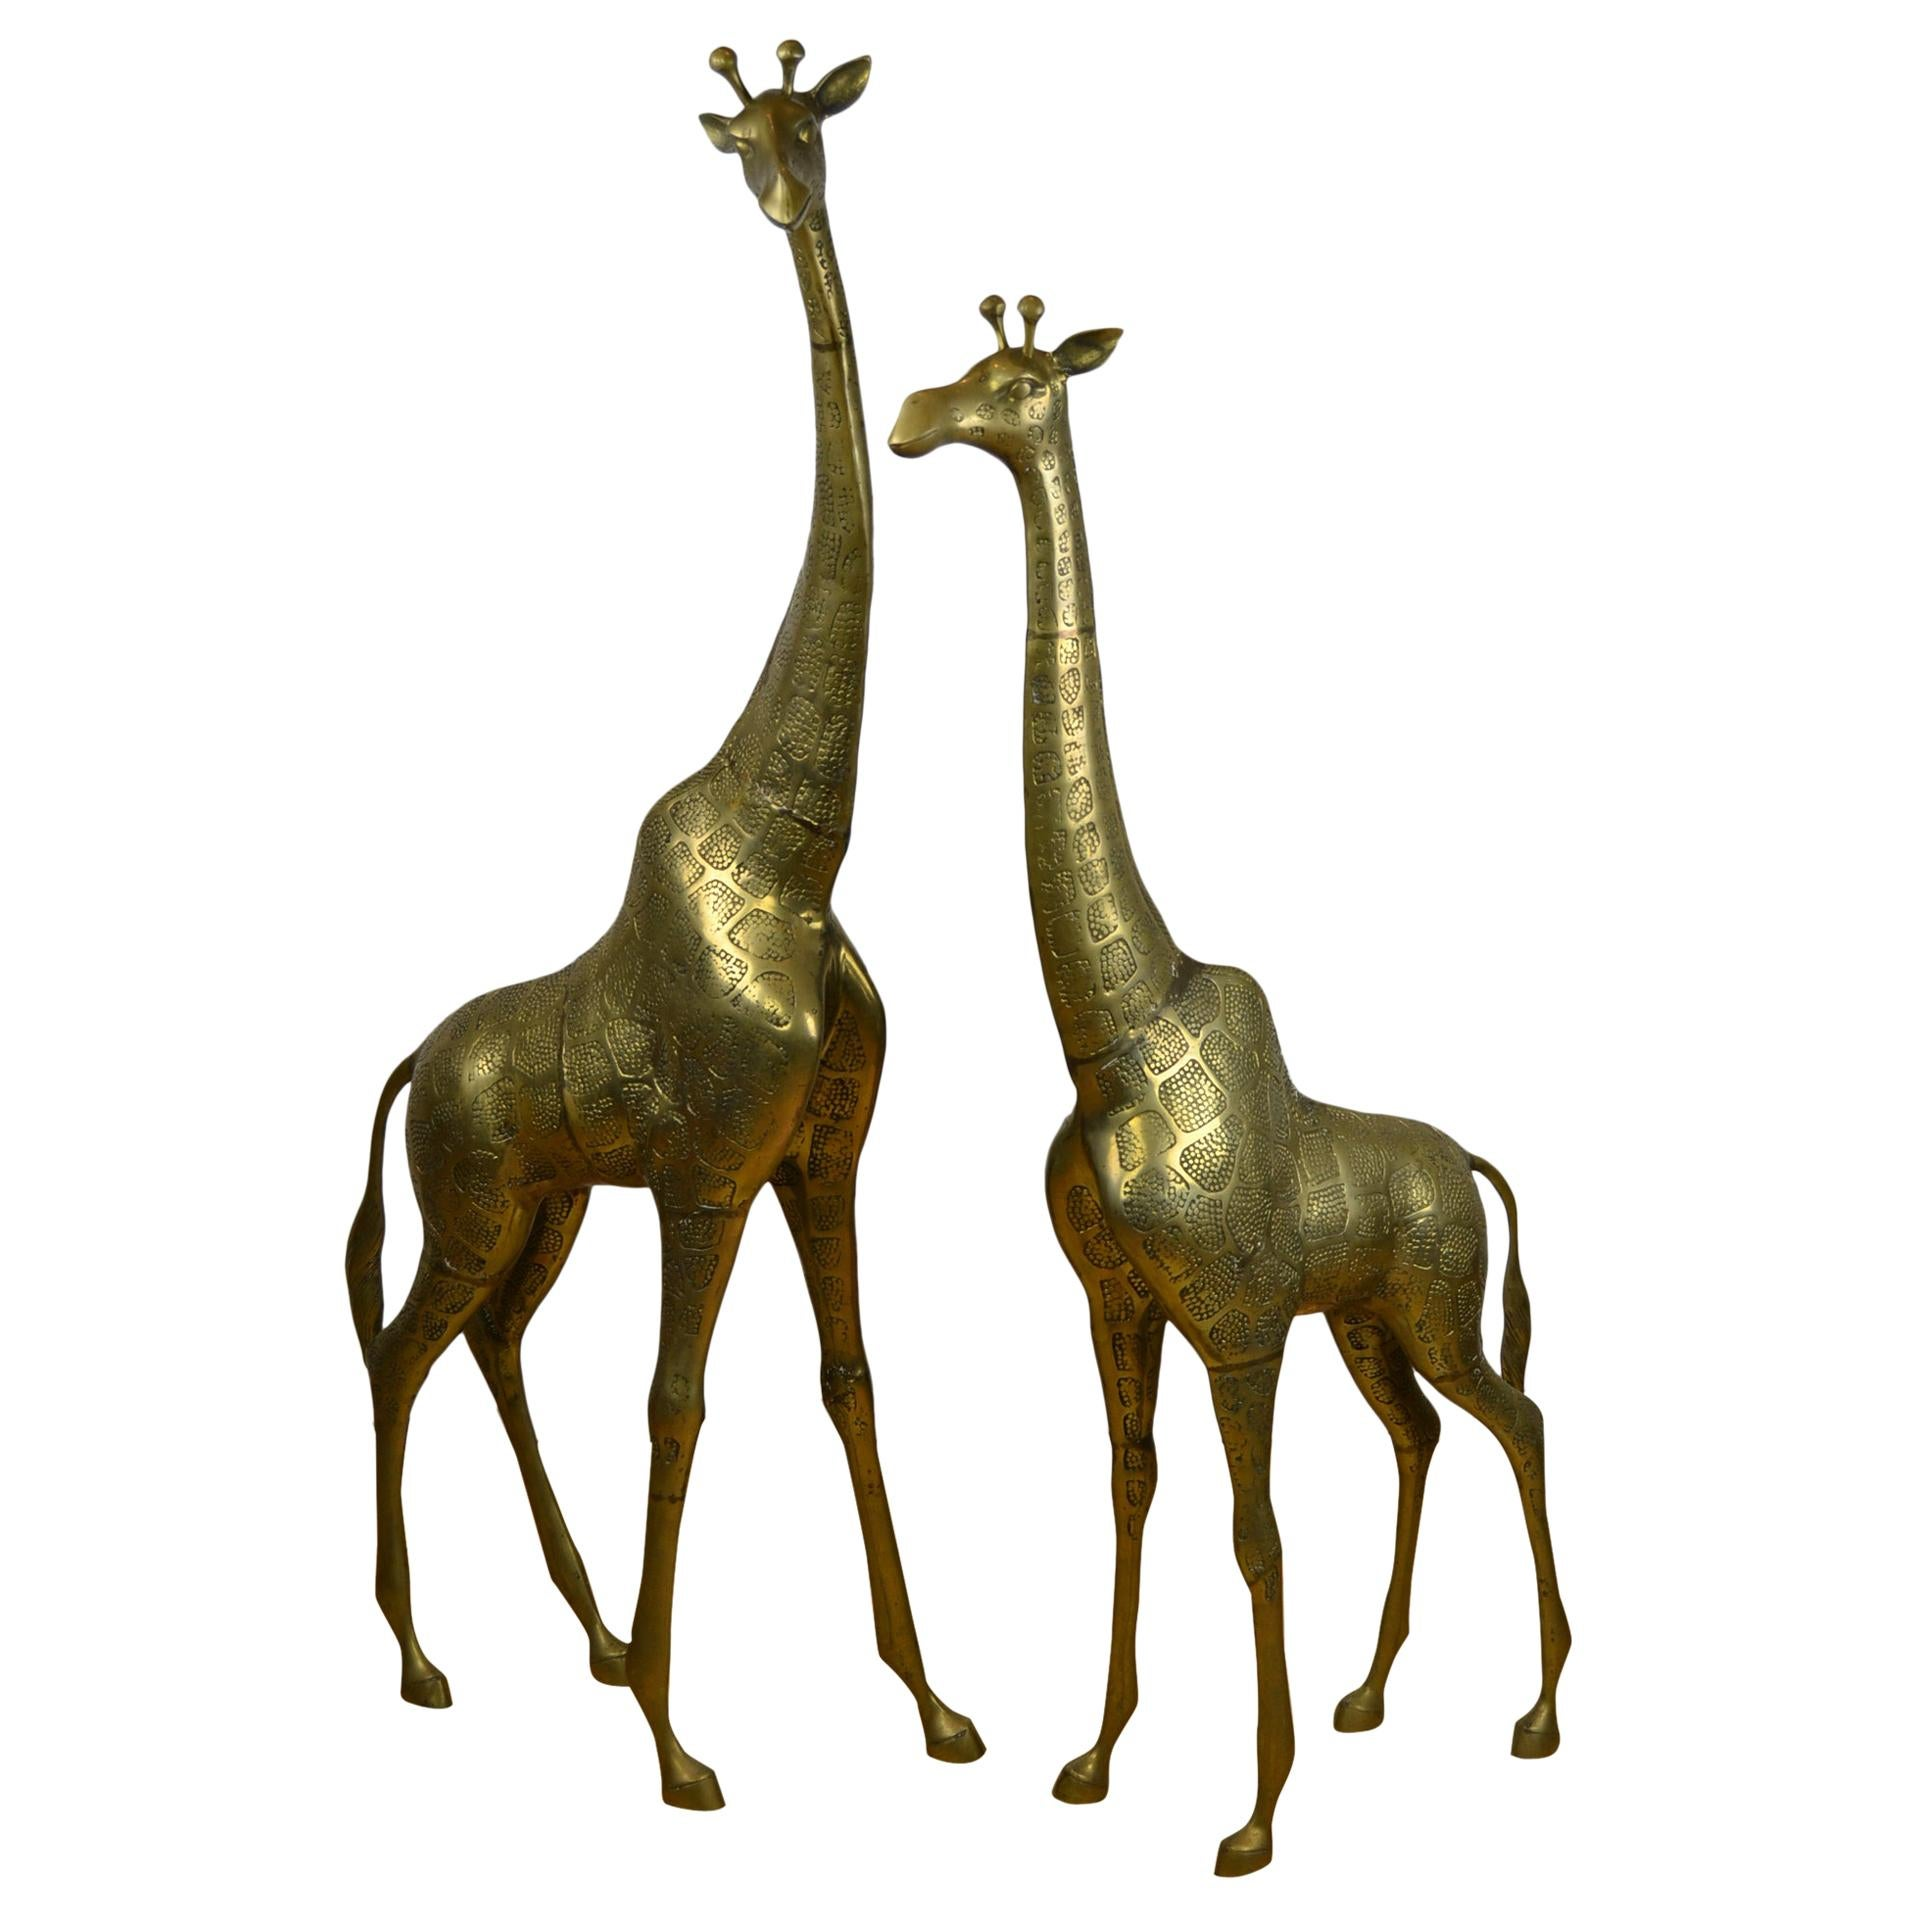 Couple of Large Brass Giraffe Floor Sculptures, Hollywood Regency, 1970s